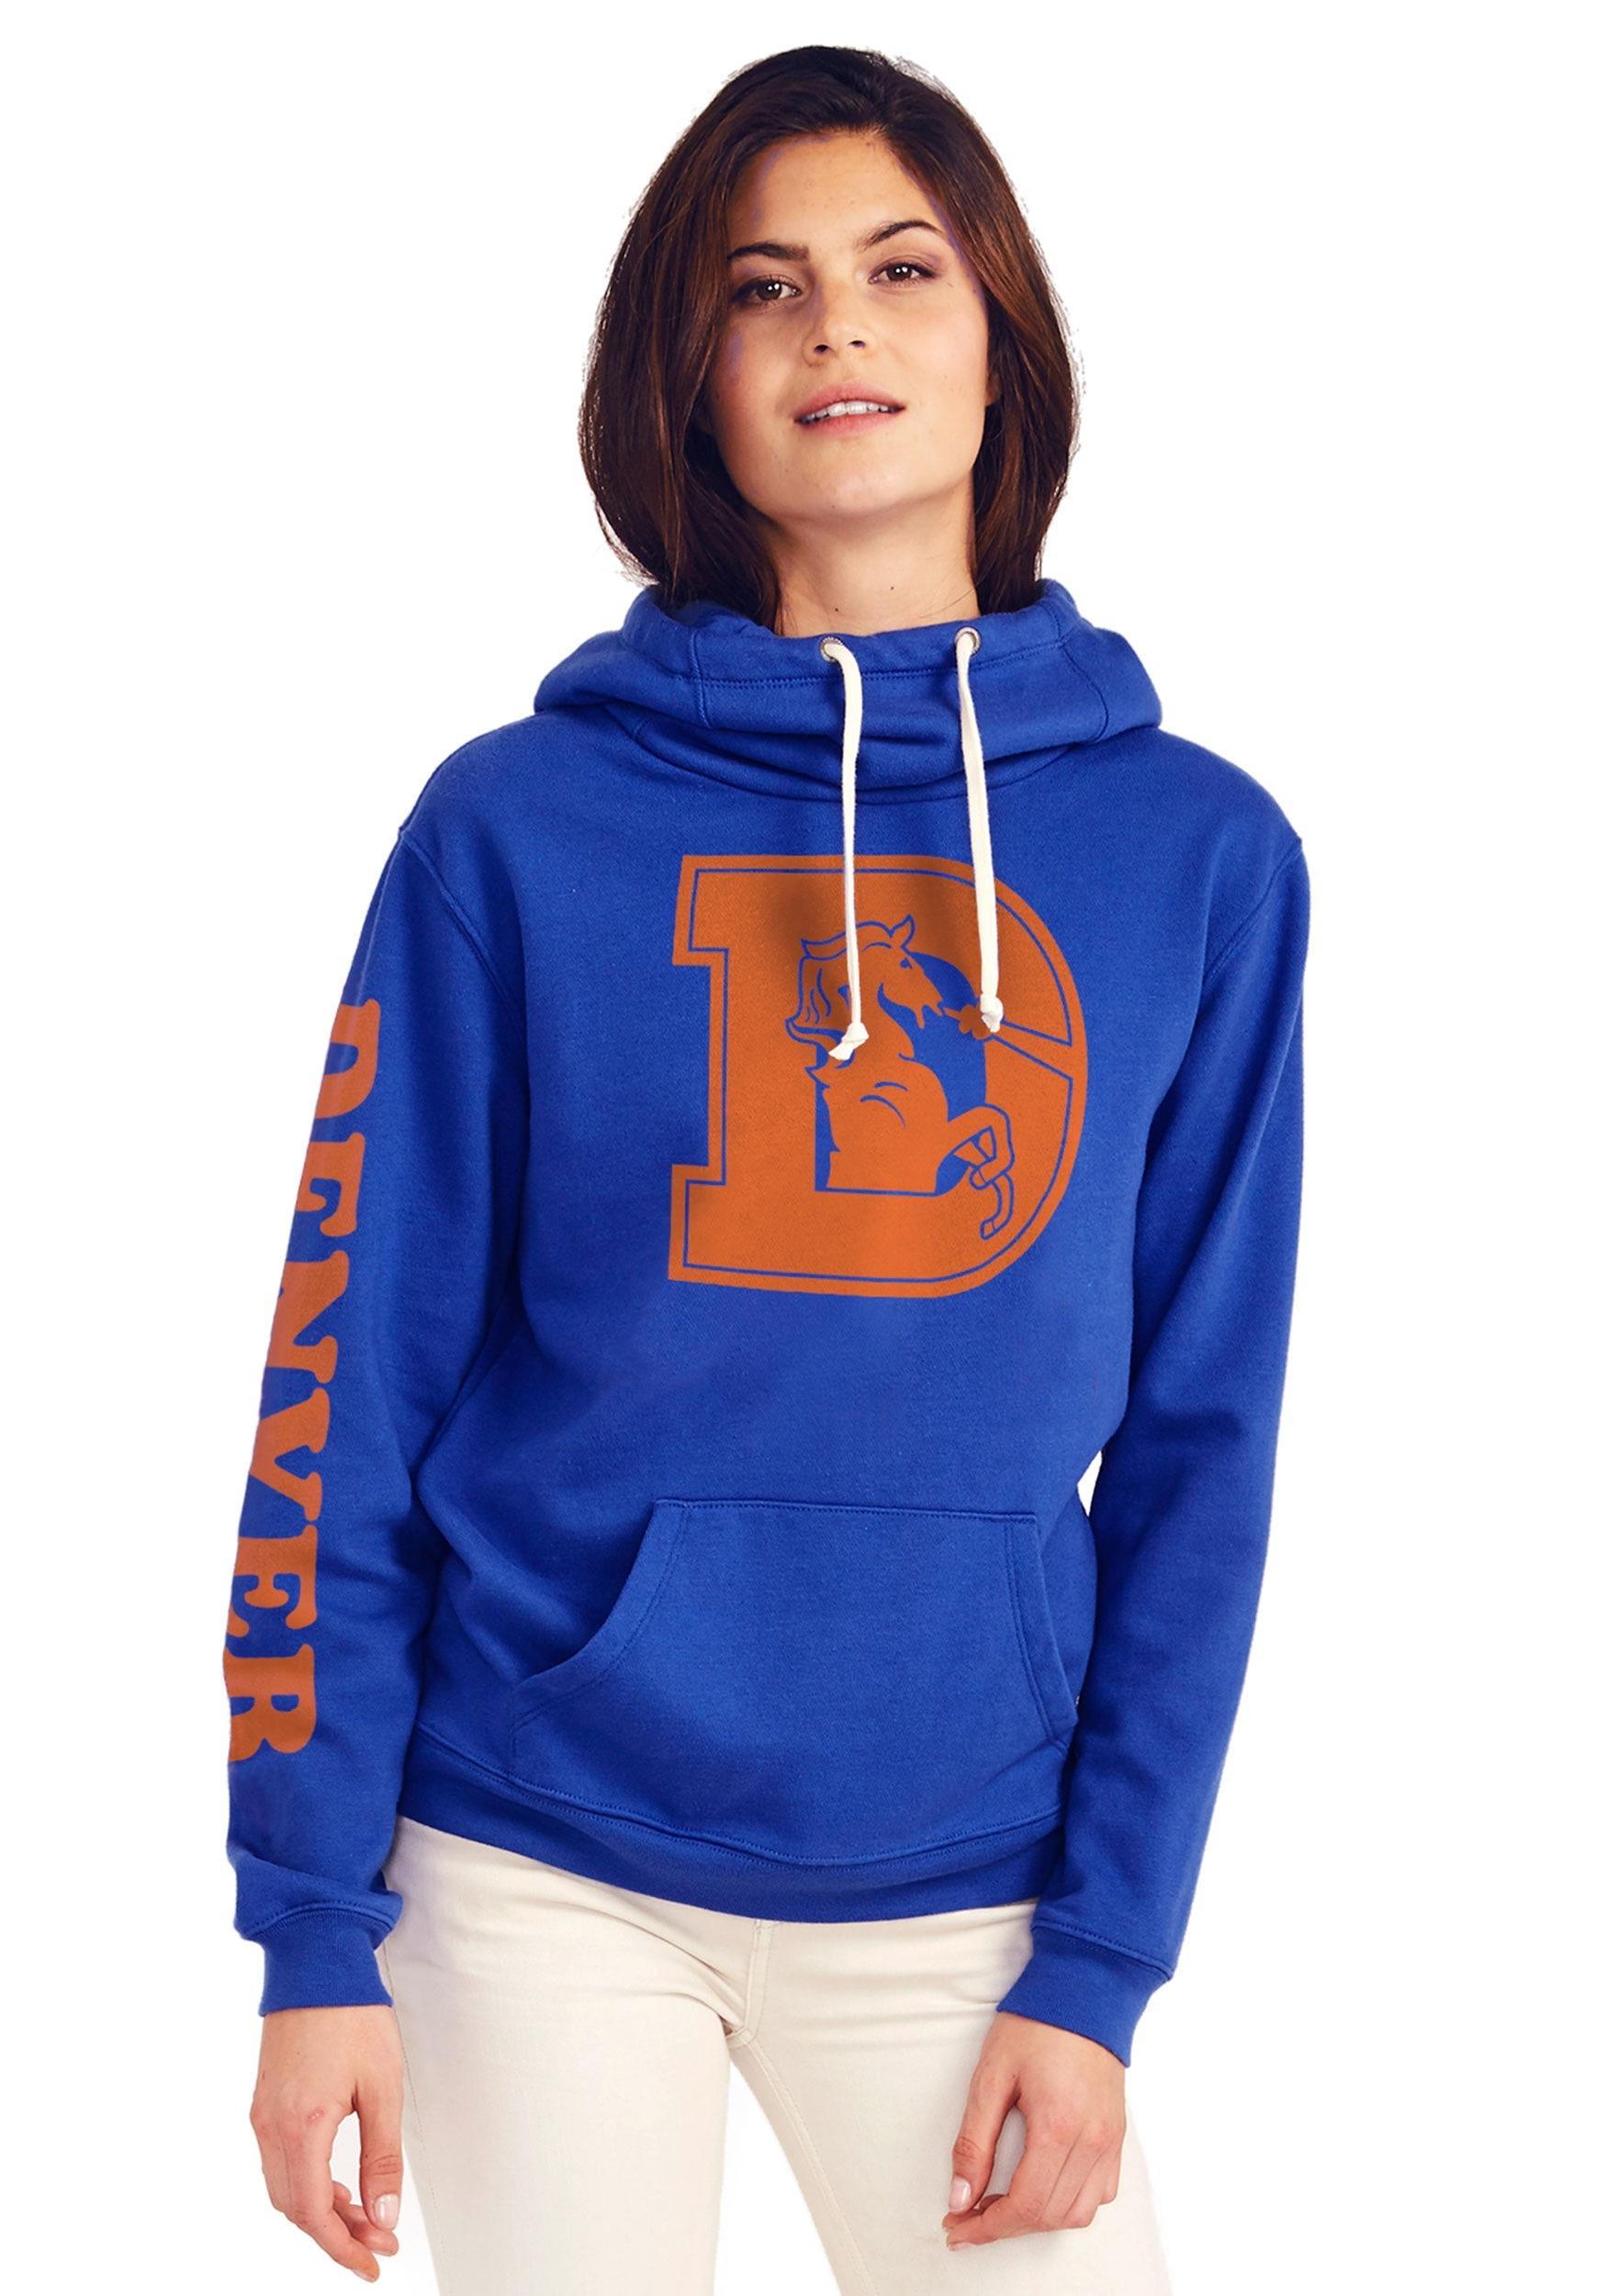 6299288debd Denver Broncos Women s Cowl Neck Hooded Sweatshirt